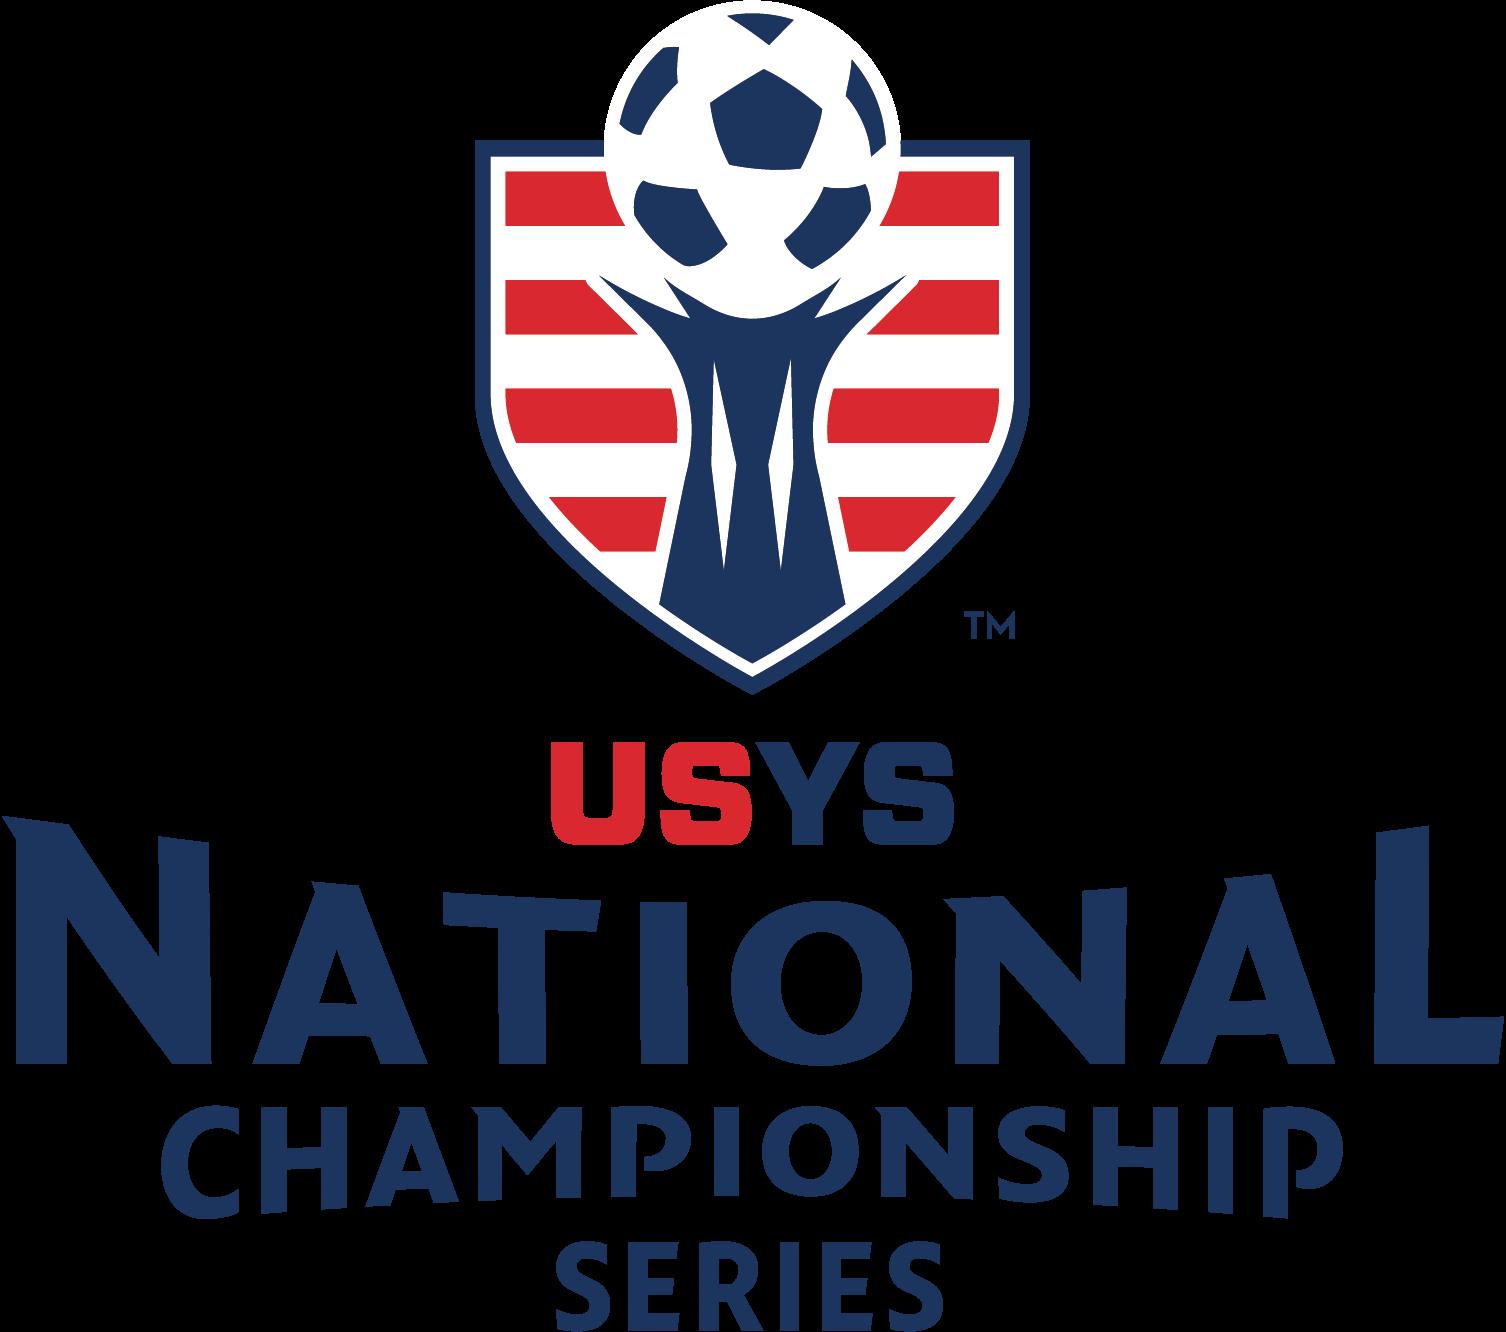 USYS National Championship Series Logo